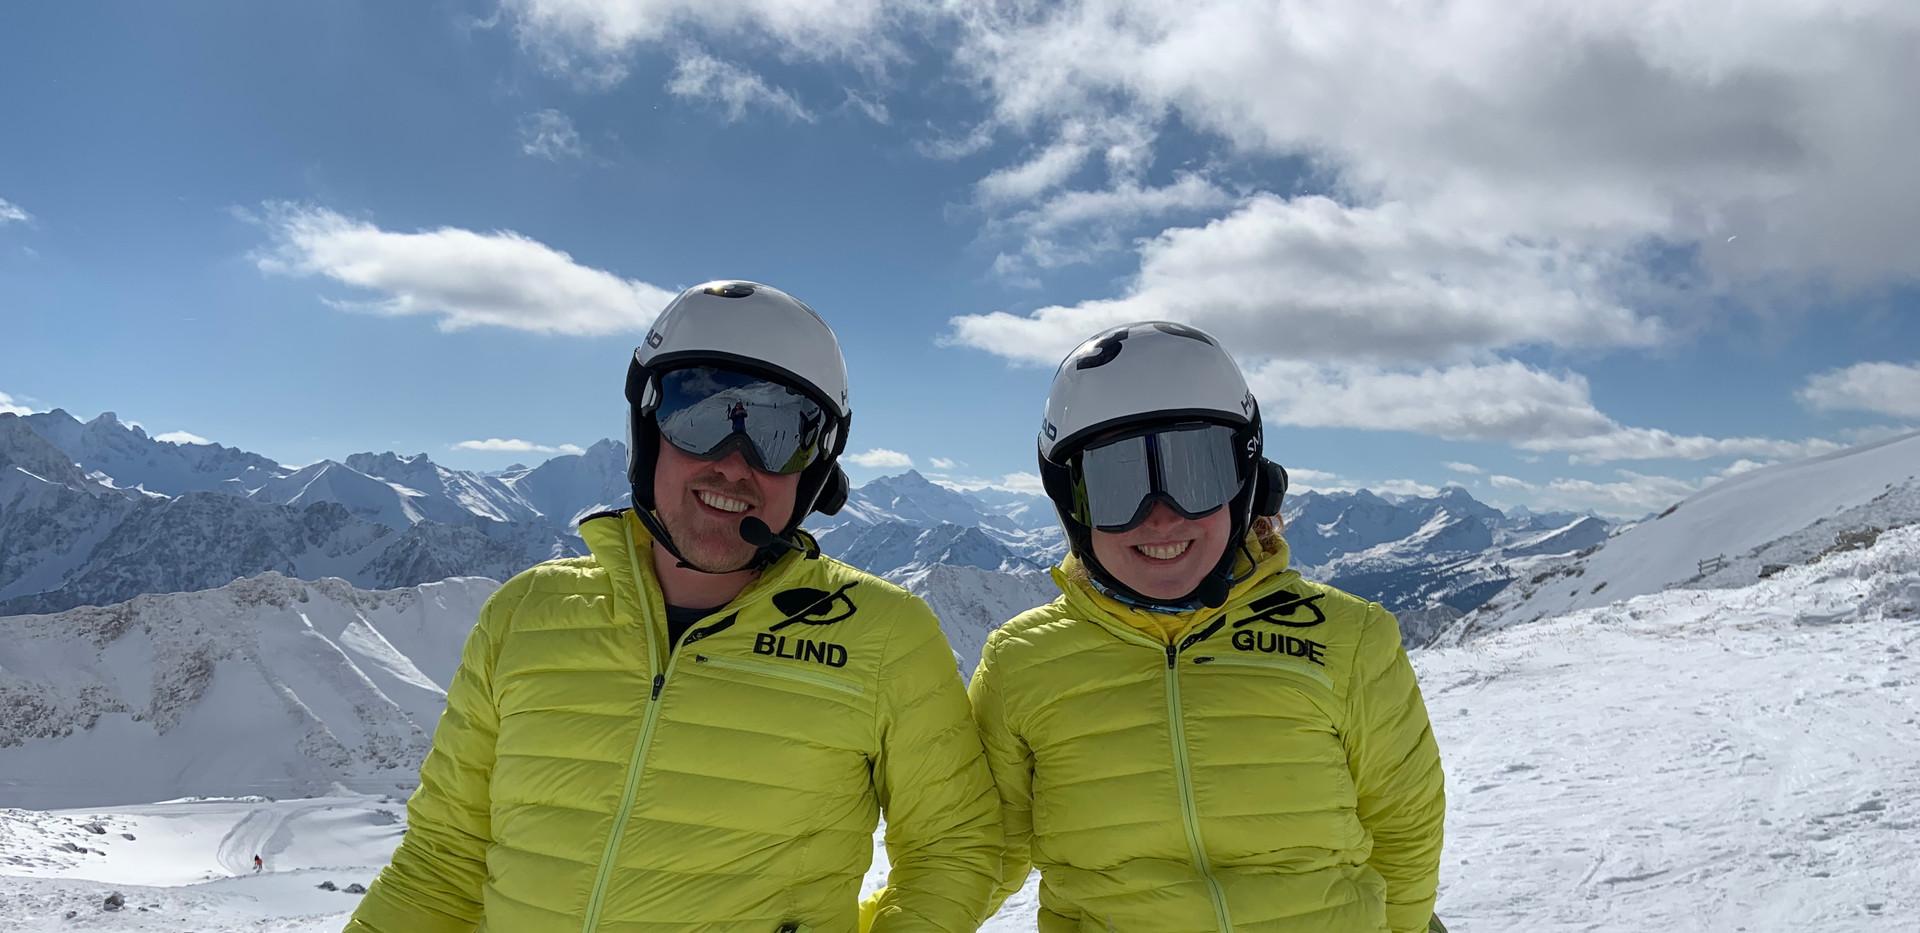 James and Alice in Oberstdorf 2020.jpg